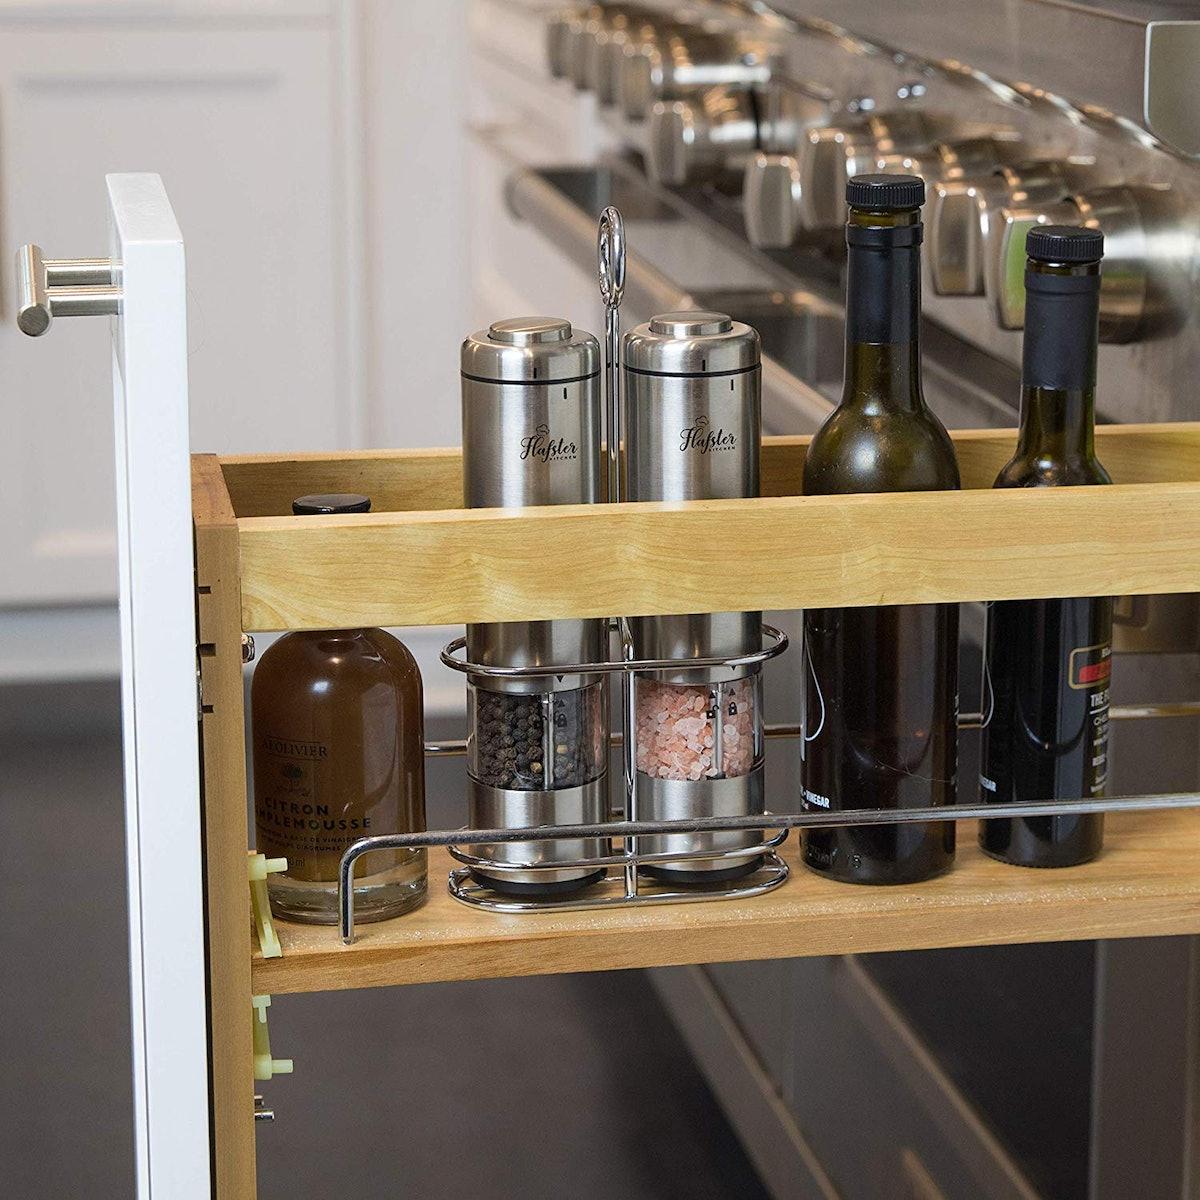 FLAFSTER KITCHEN Battery-Operated Grinder Set